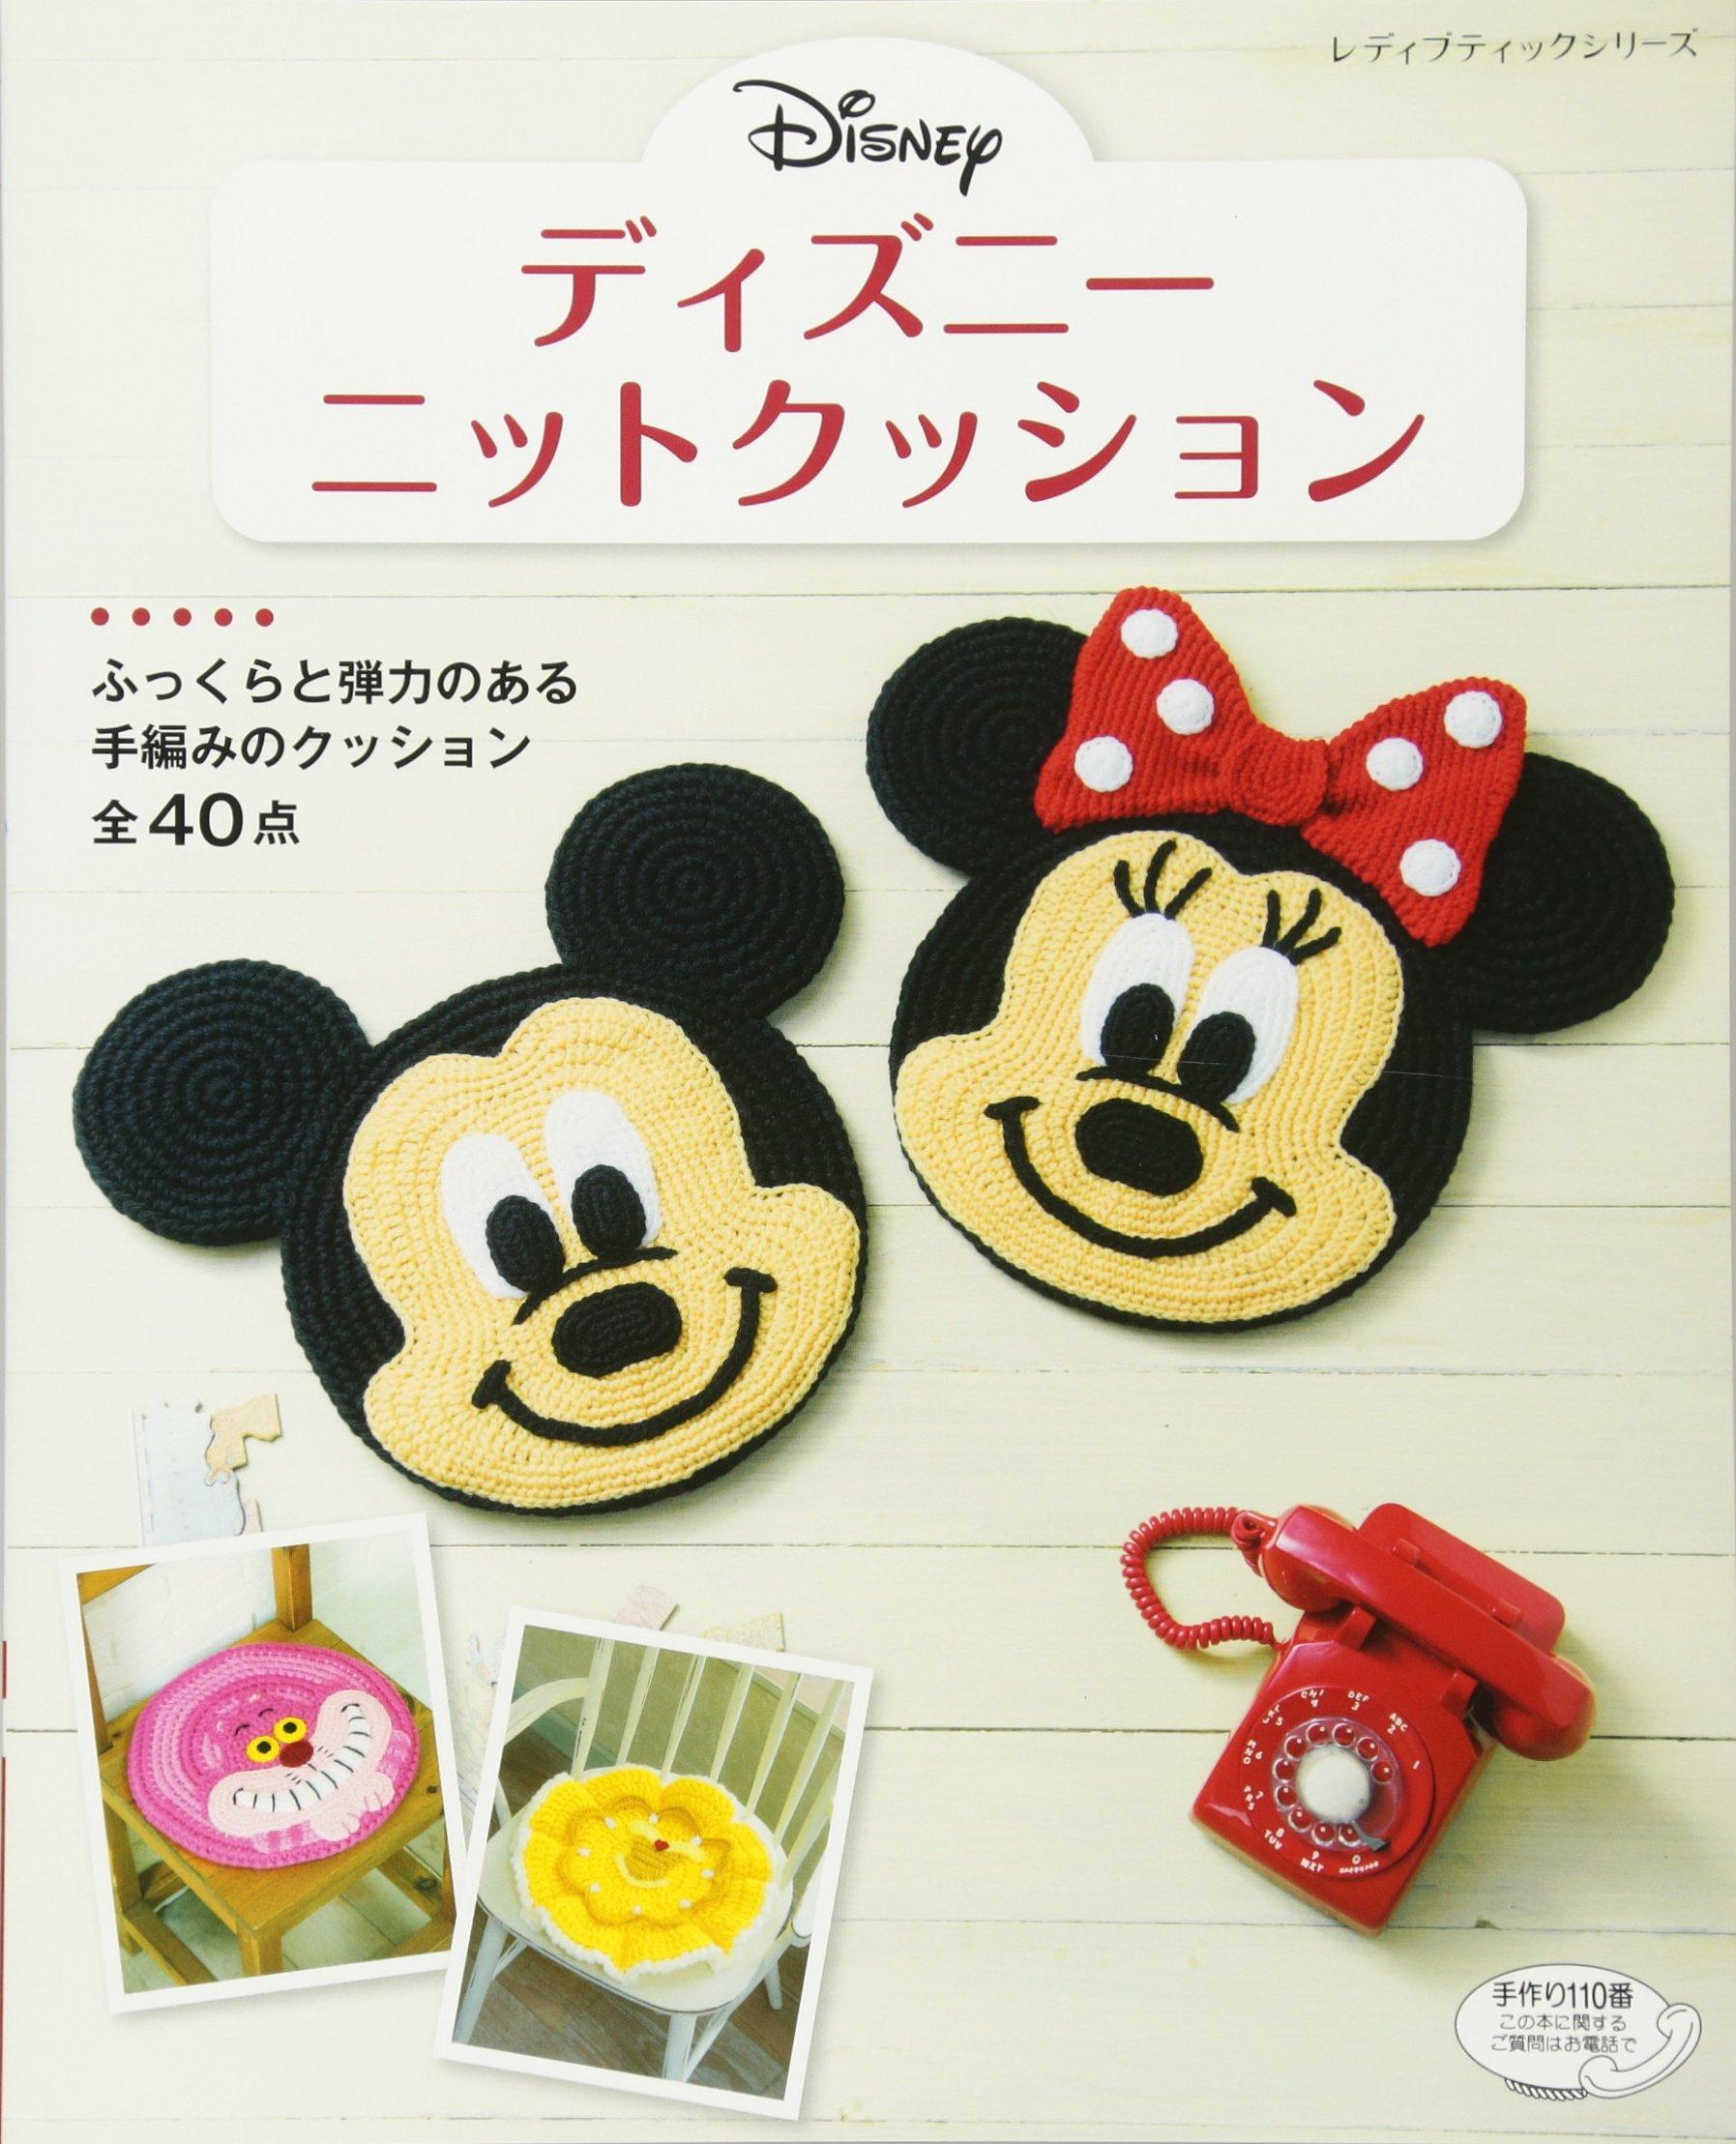 Disney Knit Cushion